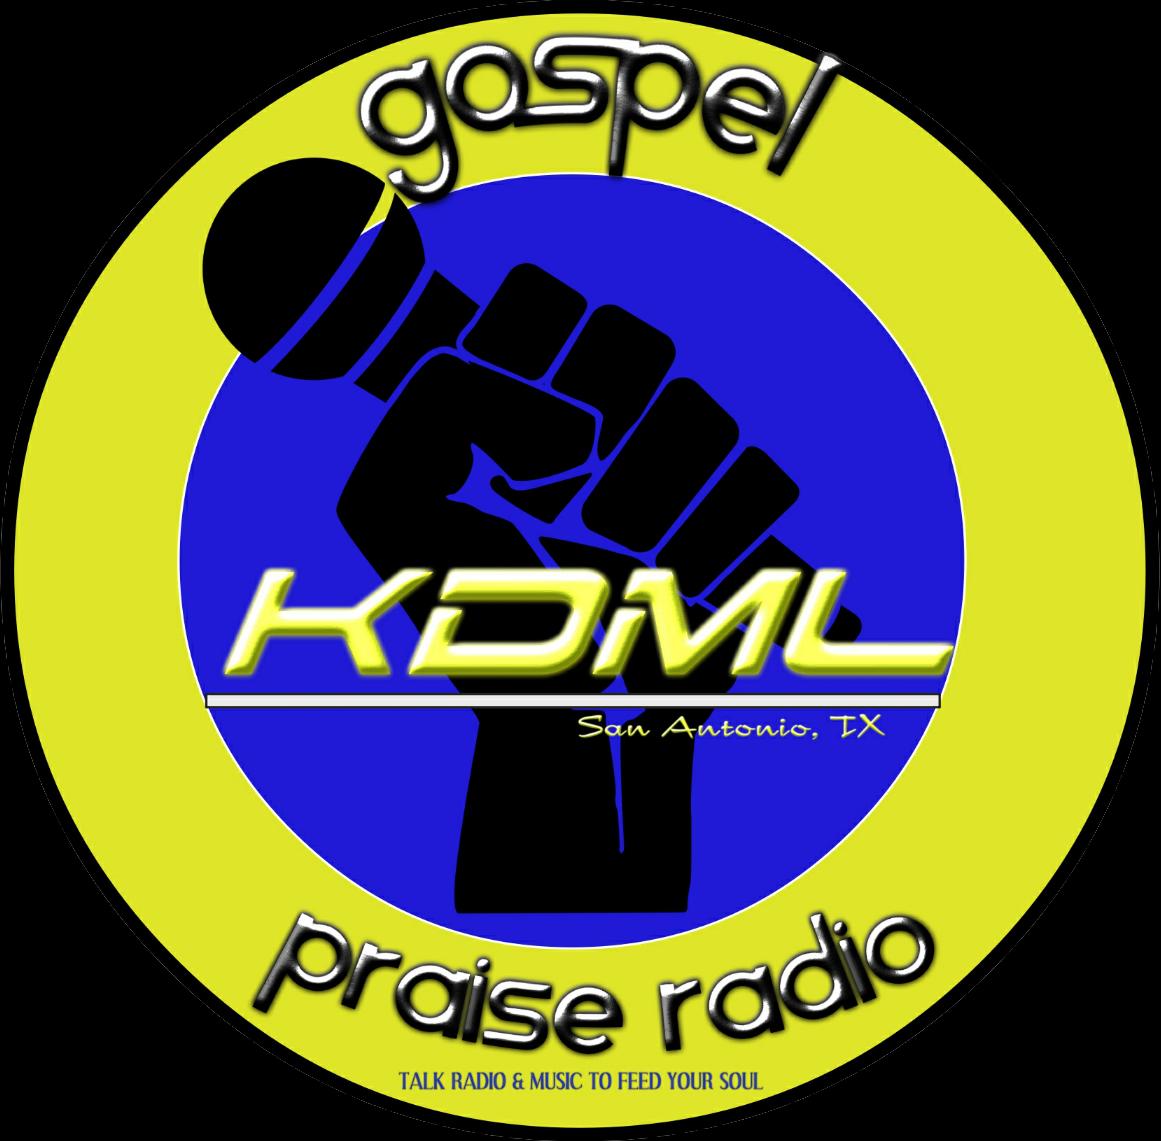 Gospel KDML Praise Radio